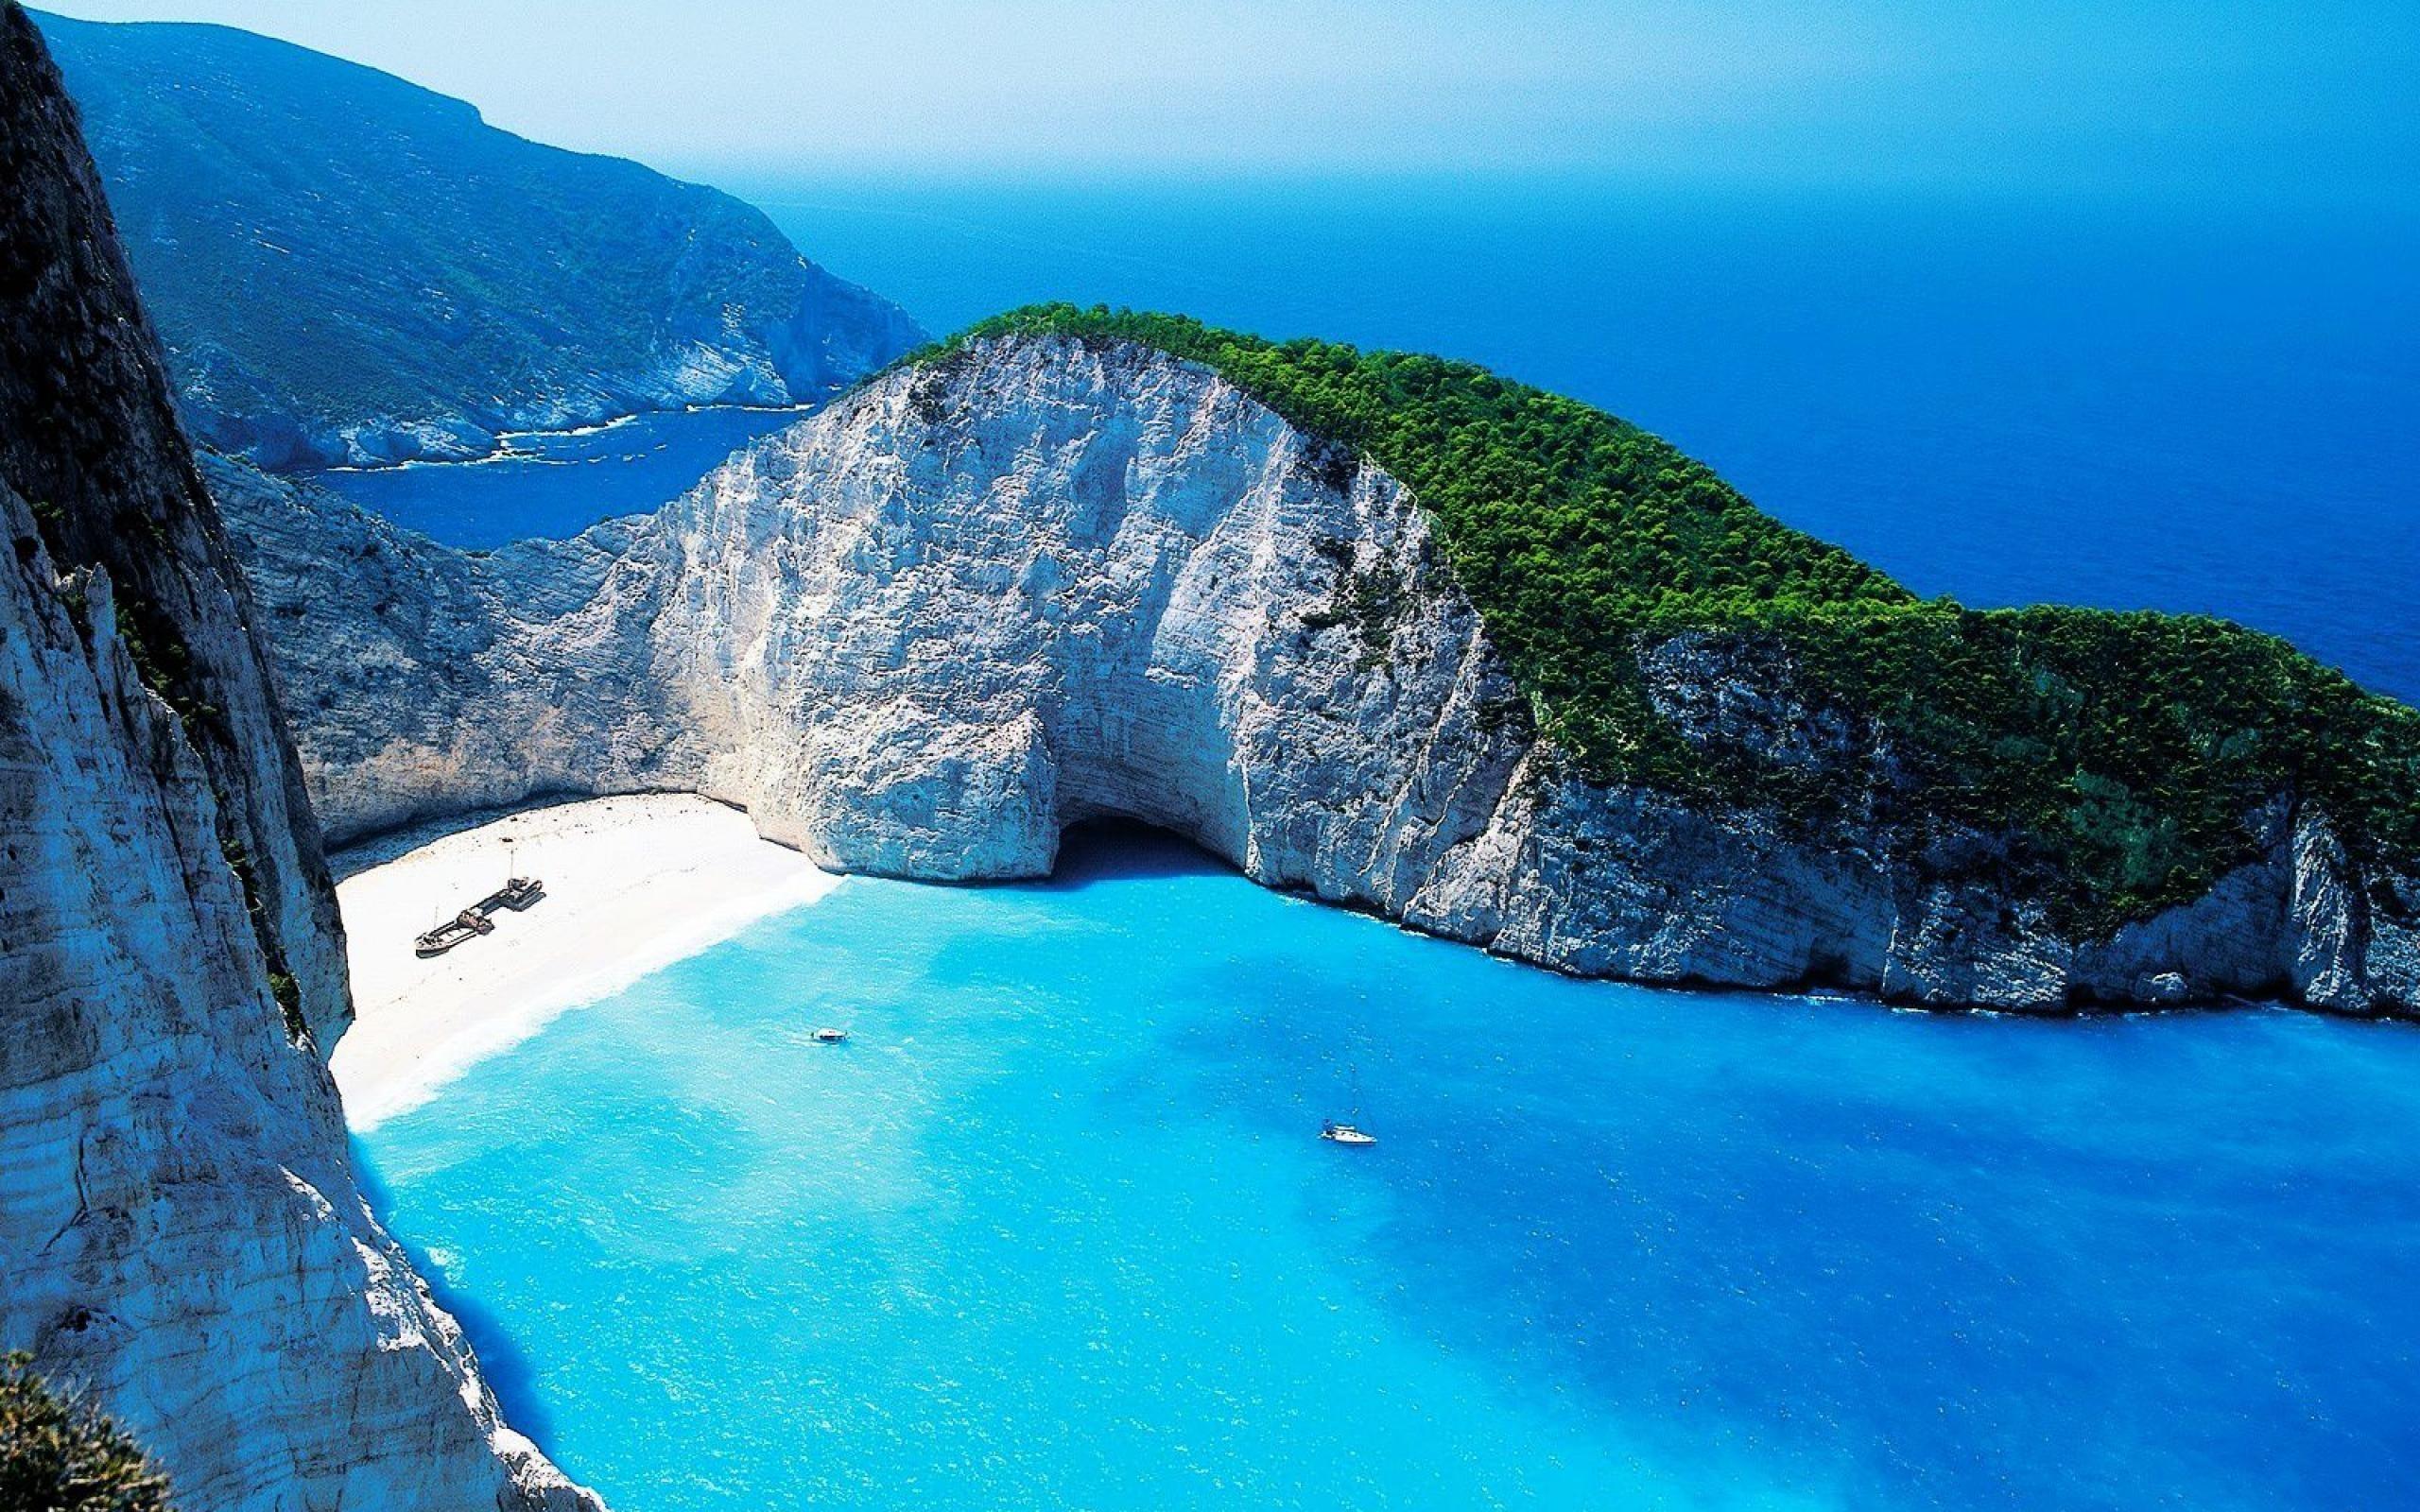 Hd wallpaper landscape - Greece Natural Landscape Hd Wallpaper 2560x1600 Wallpaper Download